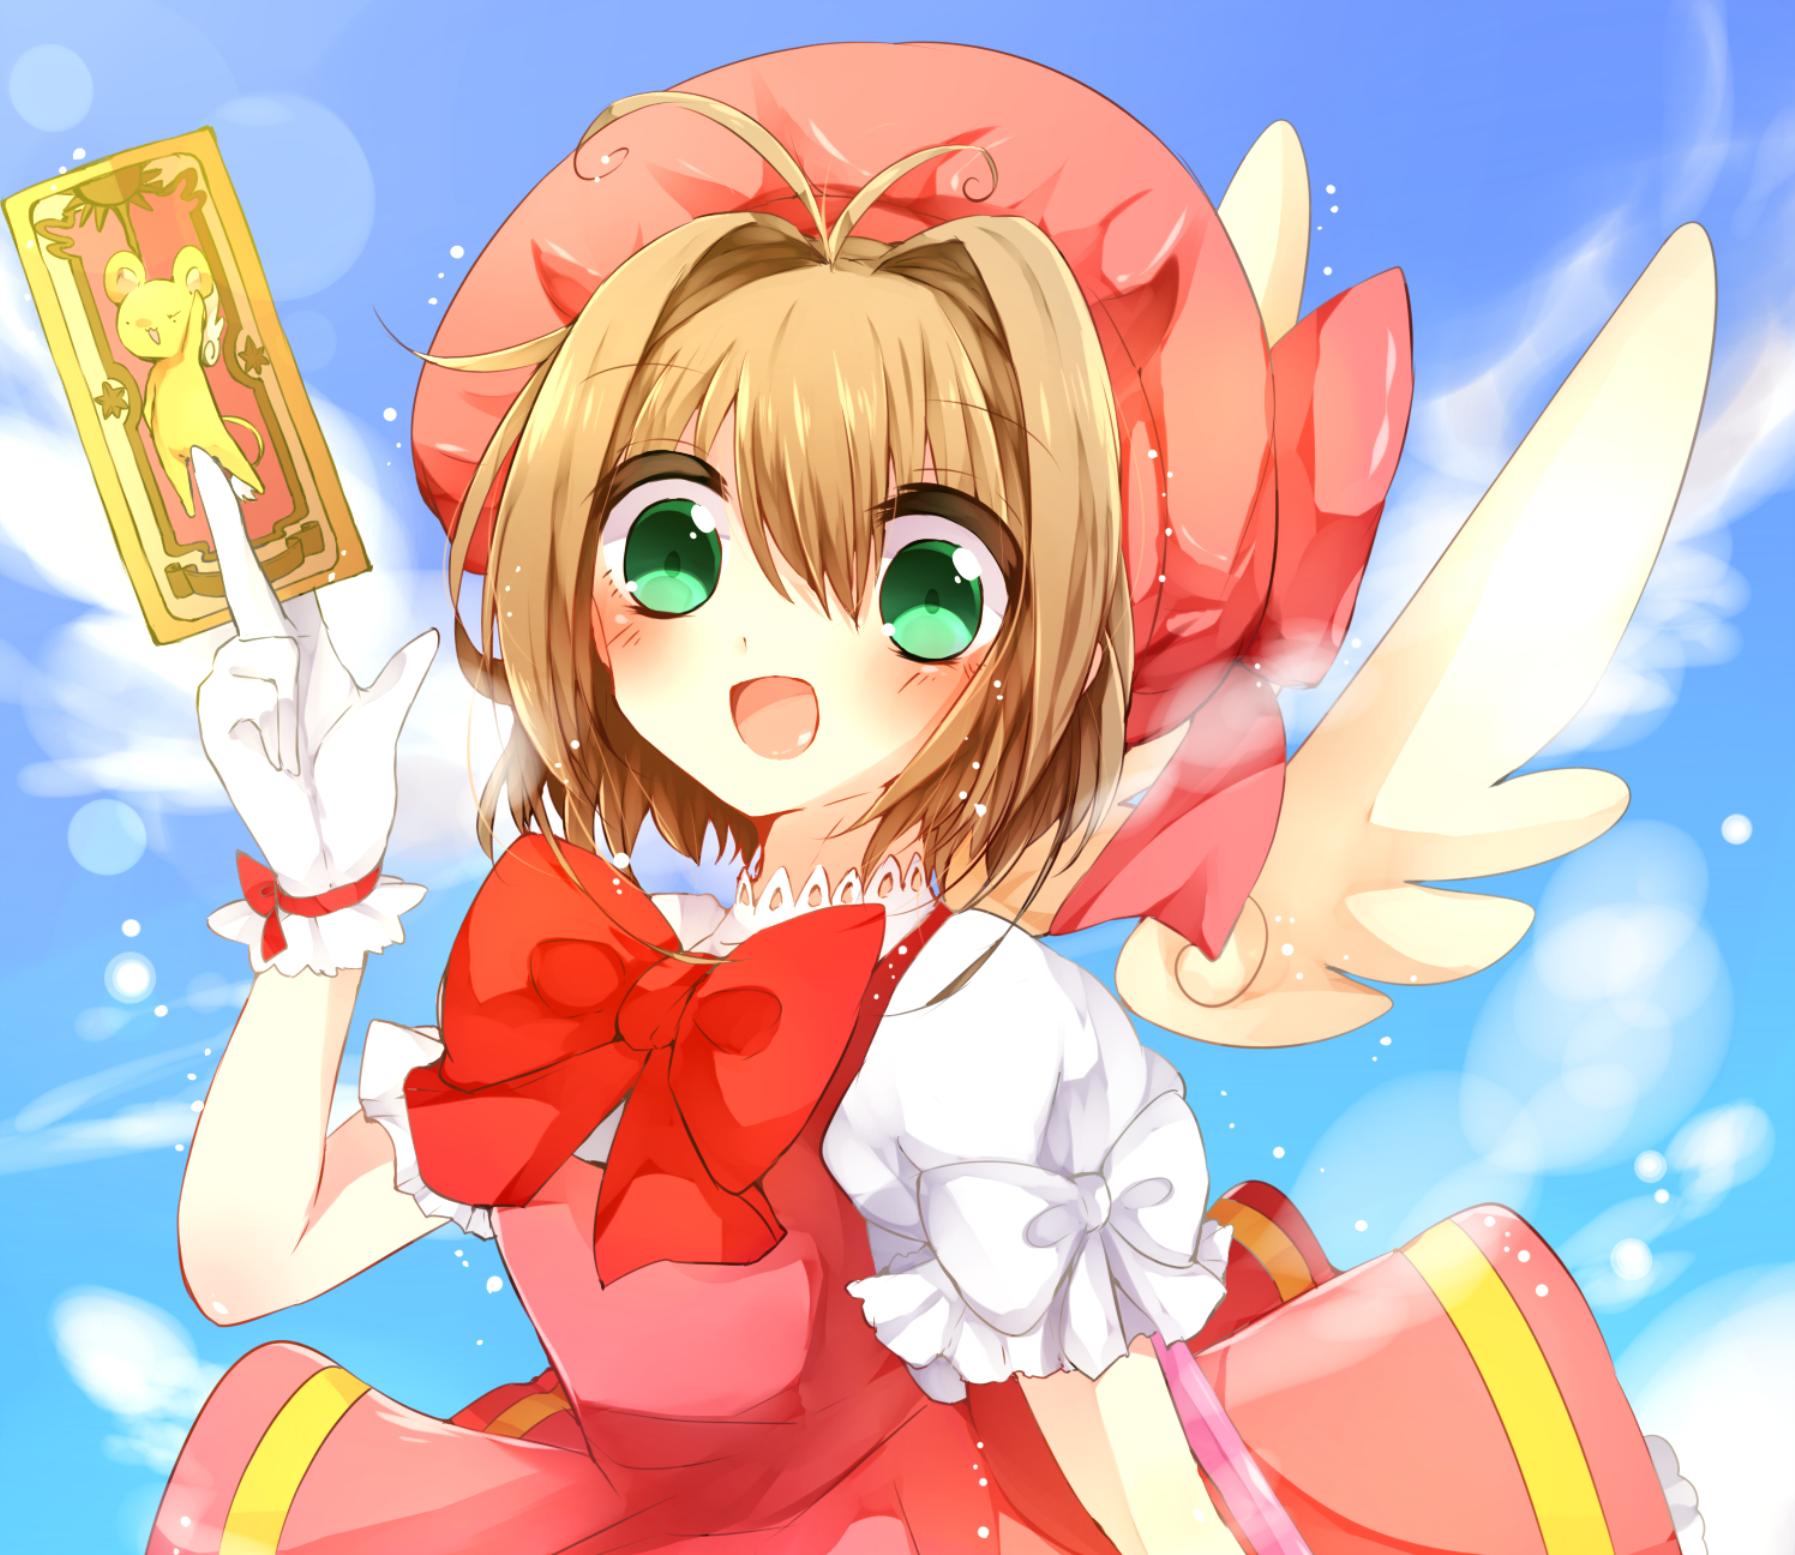 Cardcaptor Sakura Wallpaper And Background Image 1795x1555 Id 908520 Cardcaptor Sakura Cardcaptor Sakura